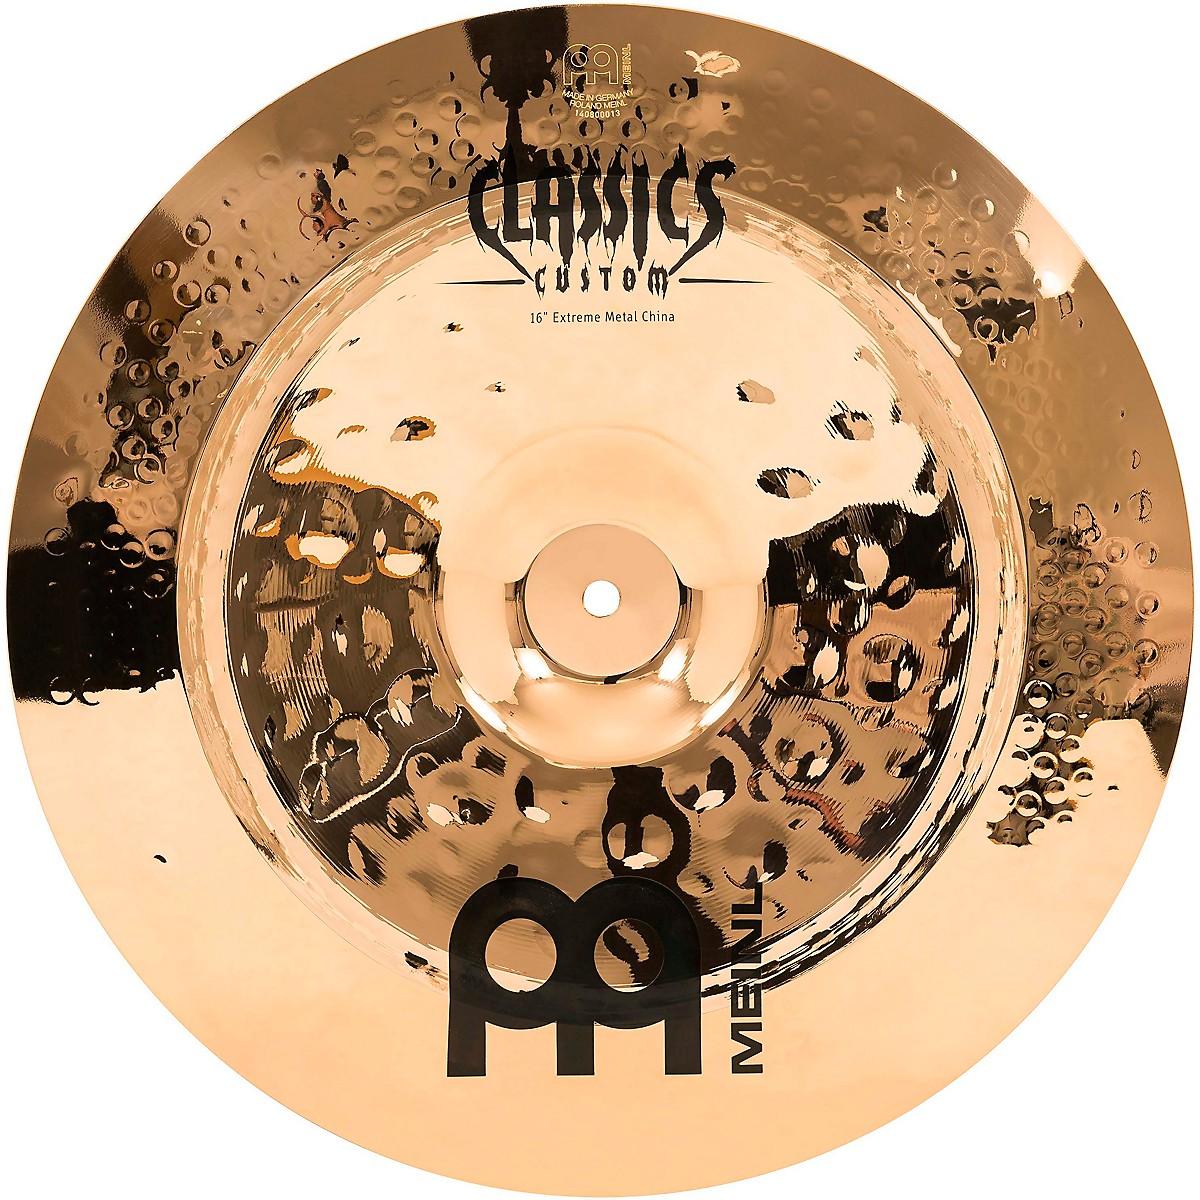 Meinl Classics Custom Extreme Metal China Cymbal